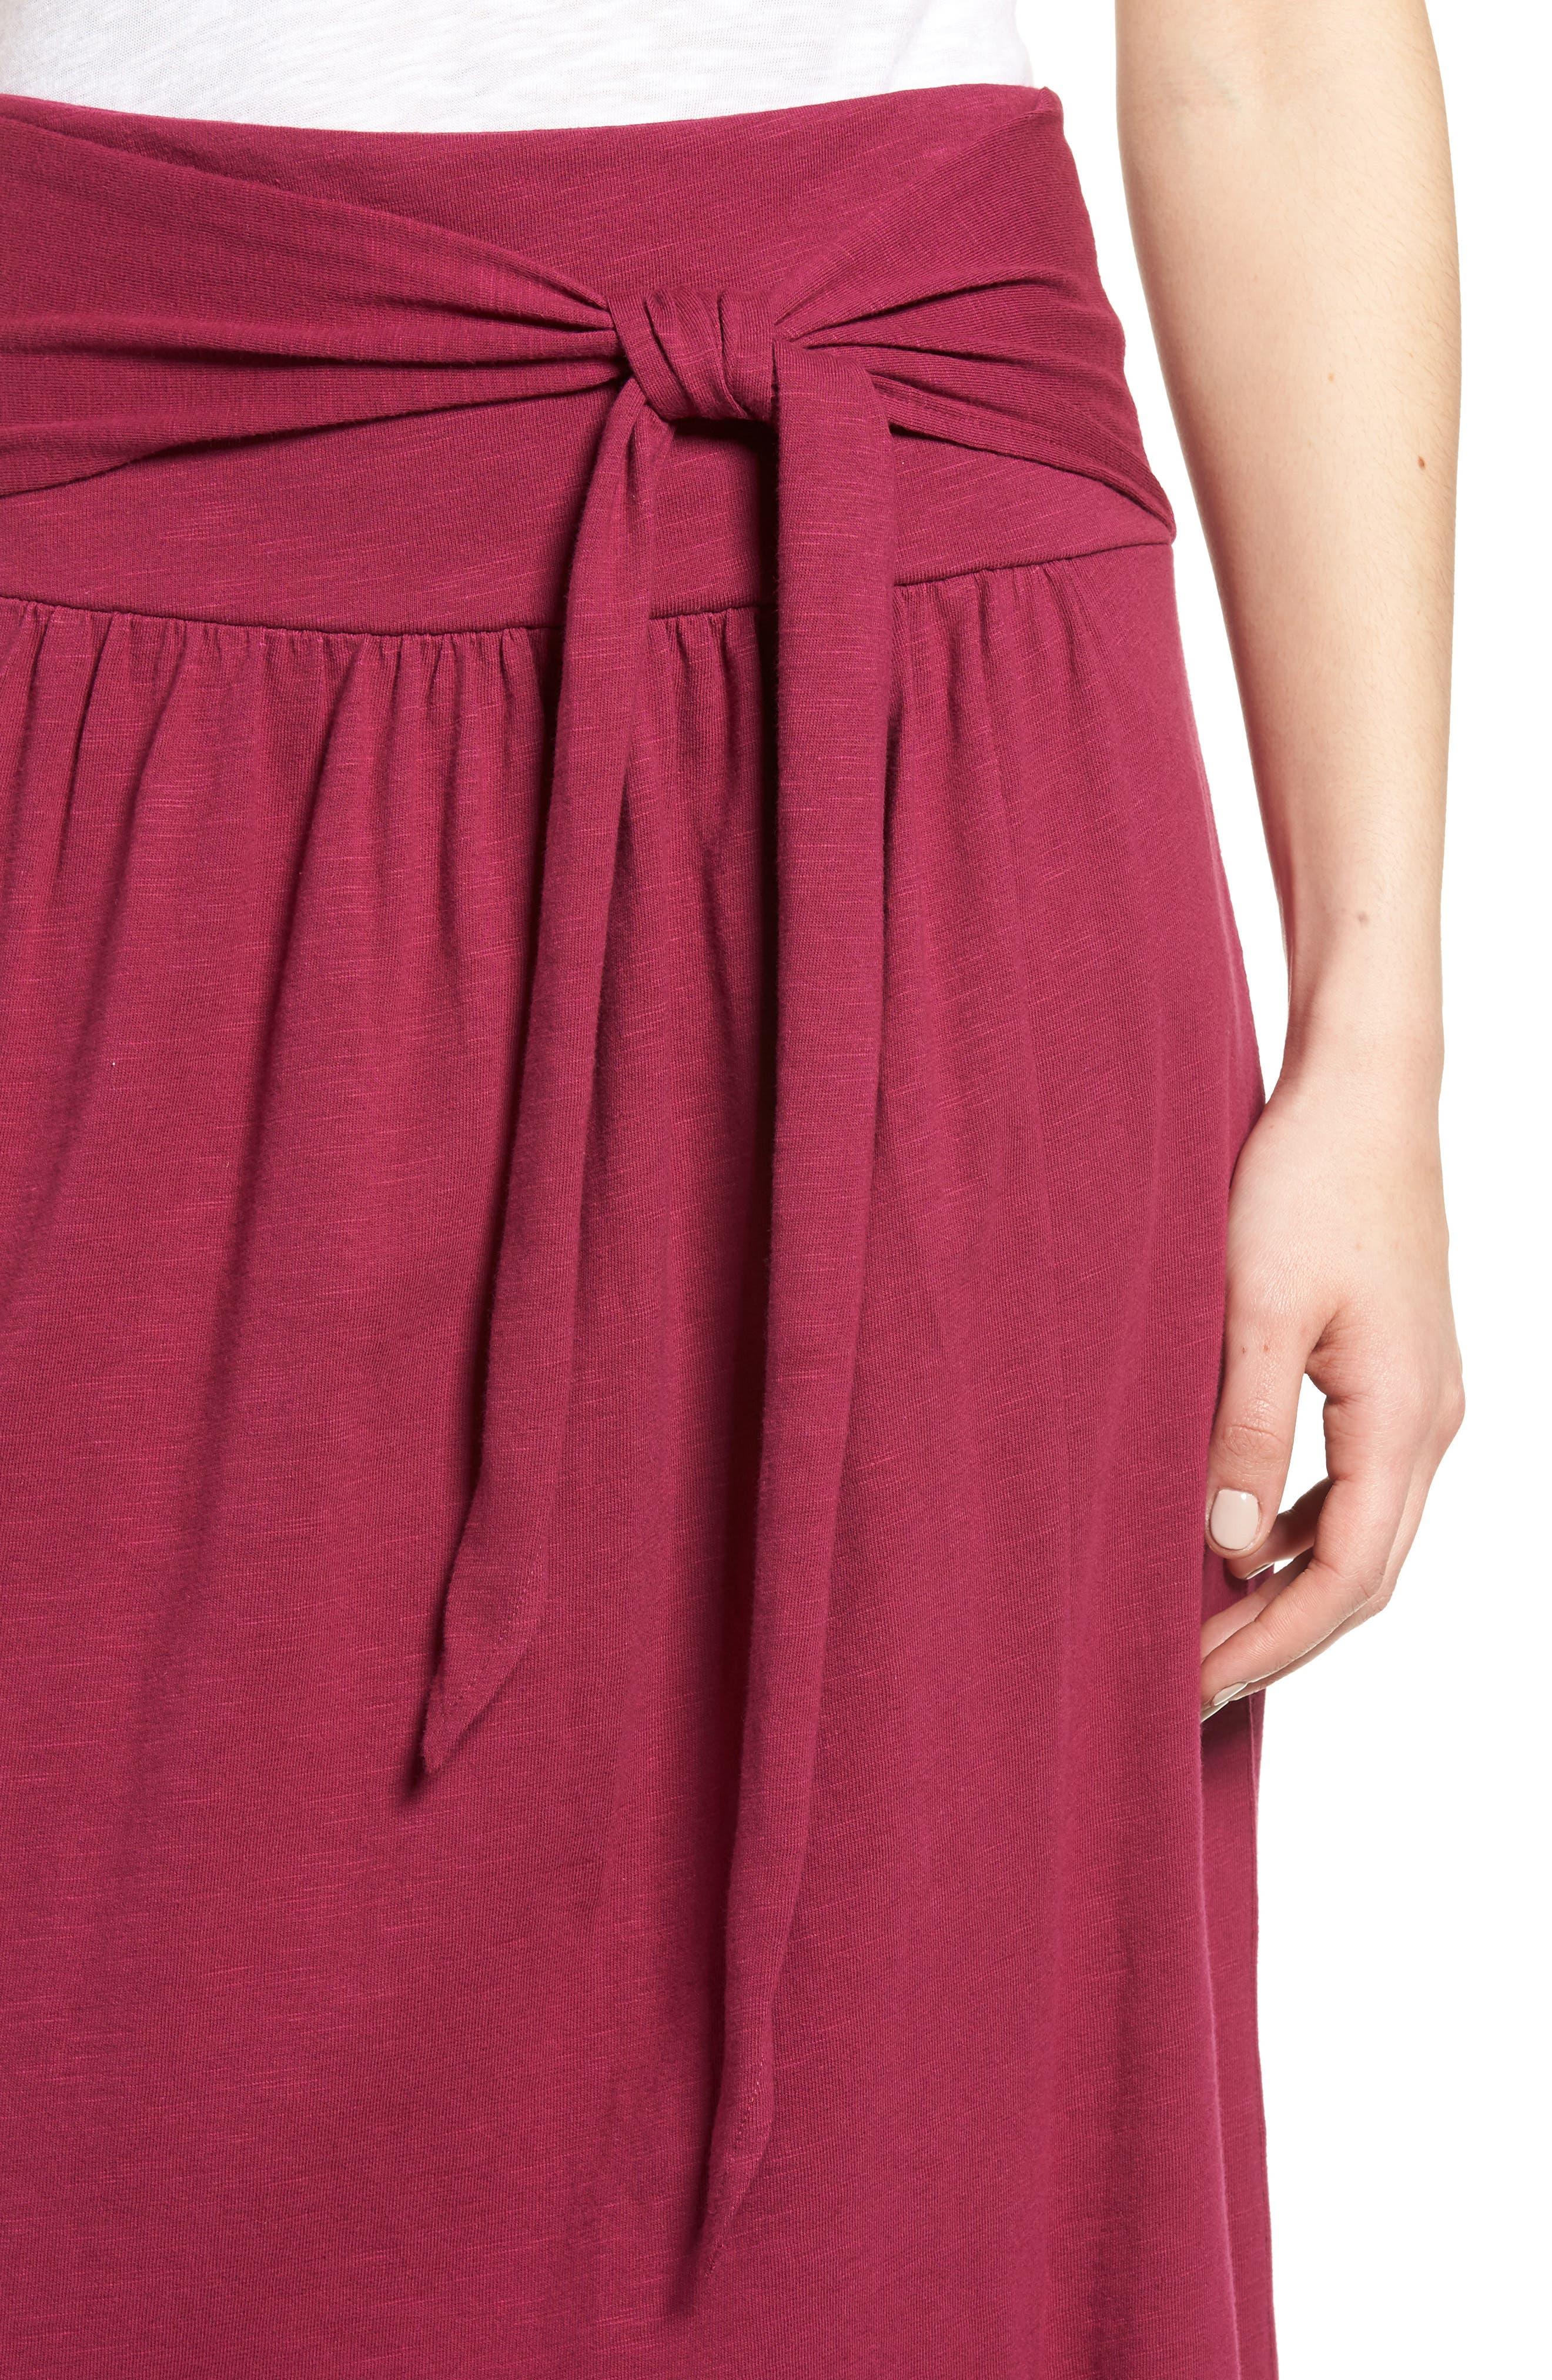 Tie Front Cotton Maxi Skirt,                             Alternate thumbnail 4, color,                             Purple Fuchsia